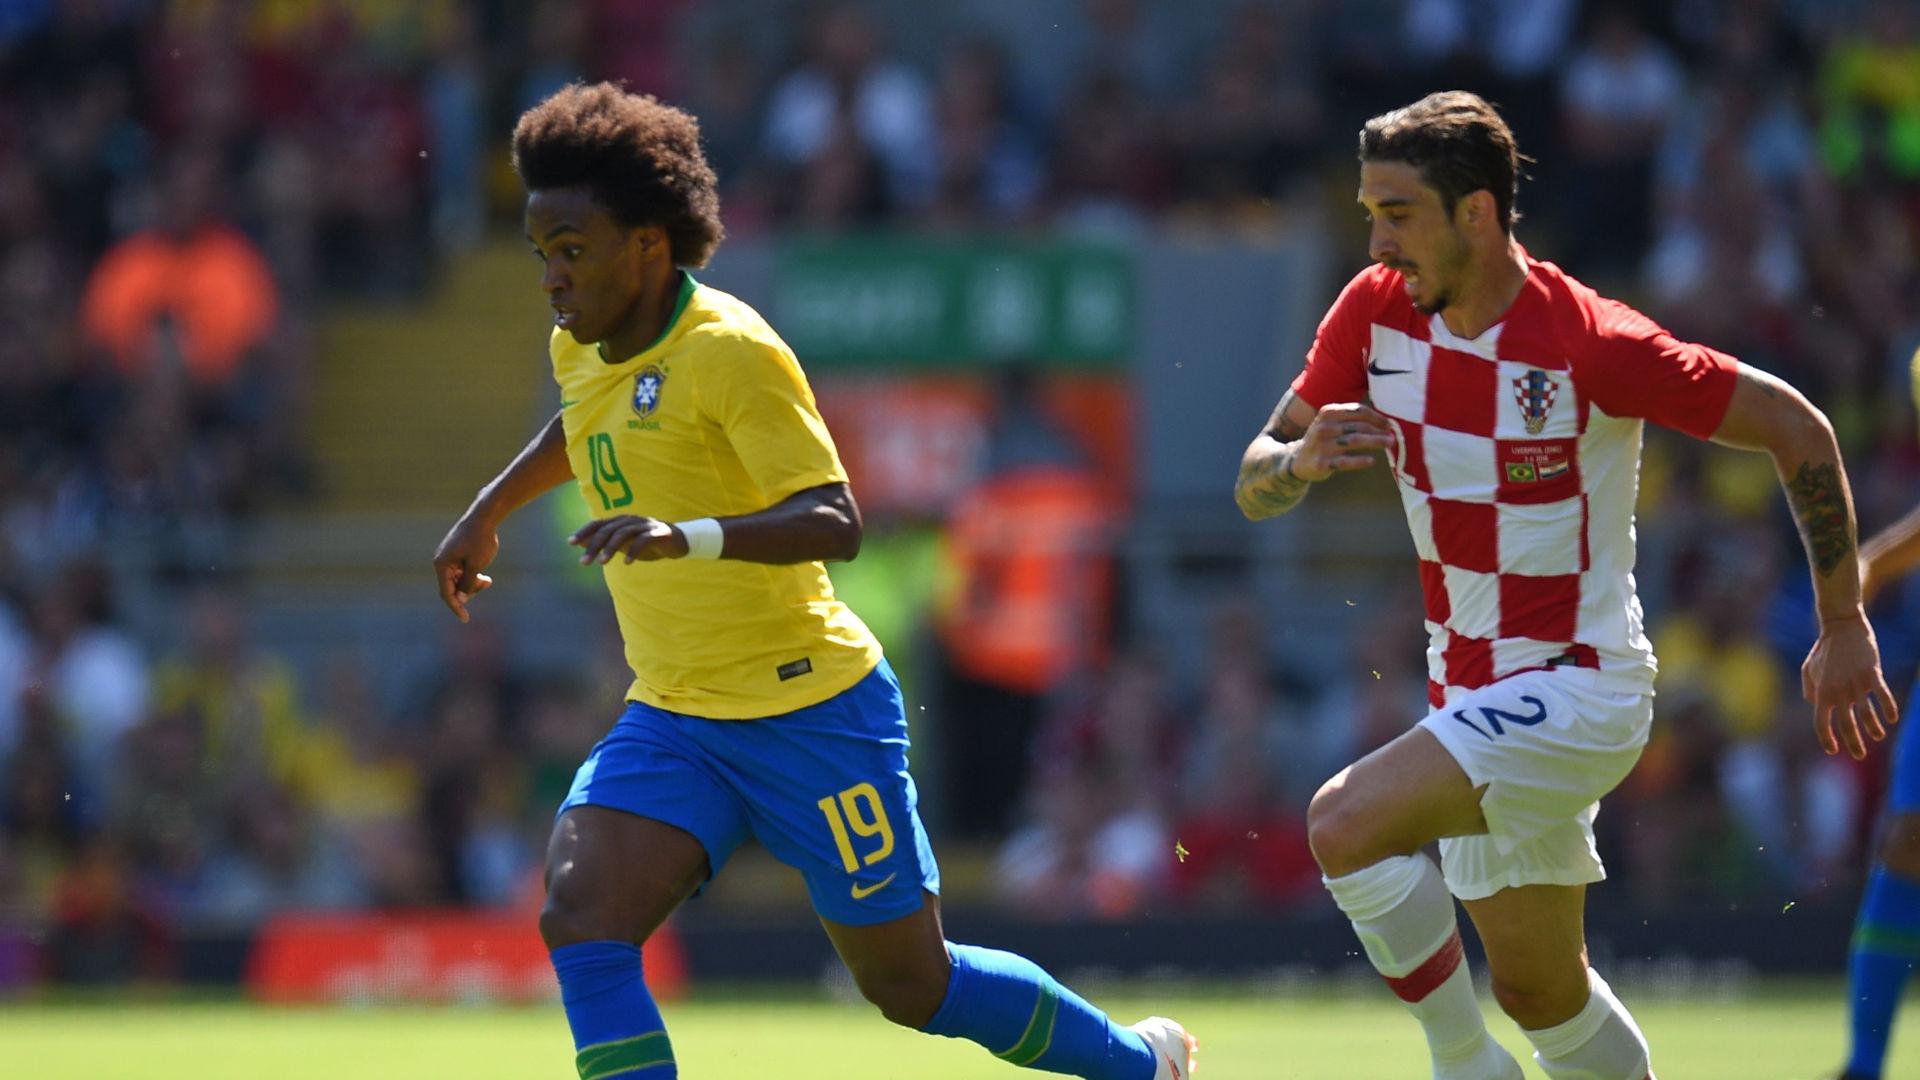 Willian Vrsaljko Brazil Croatia Friendlies 03062018